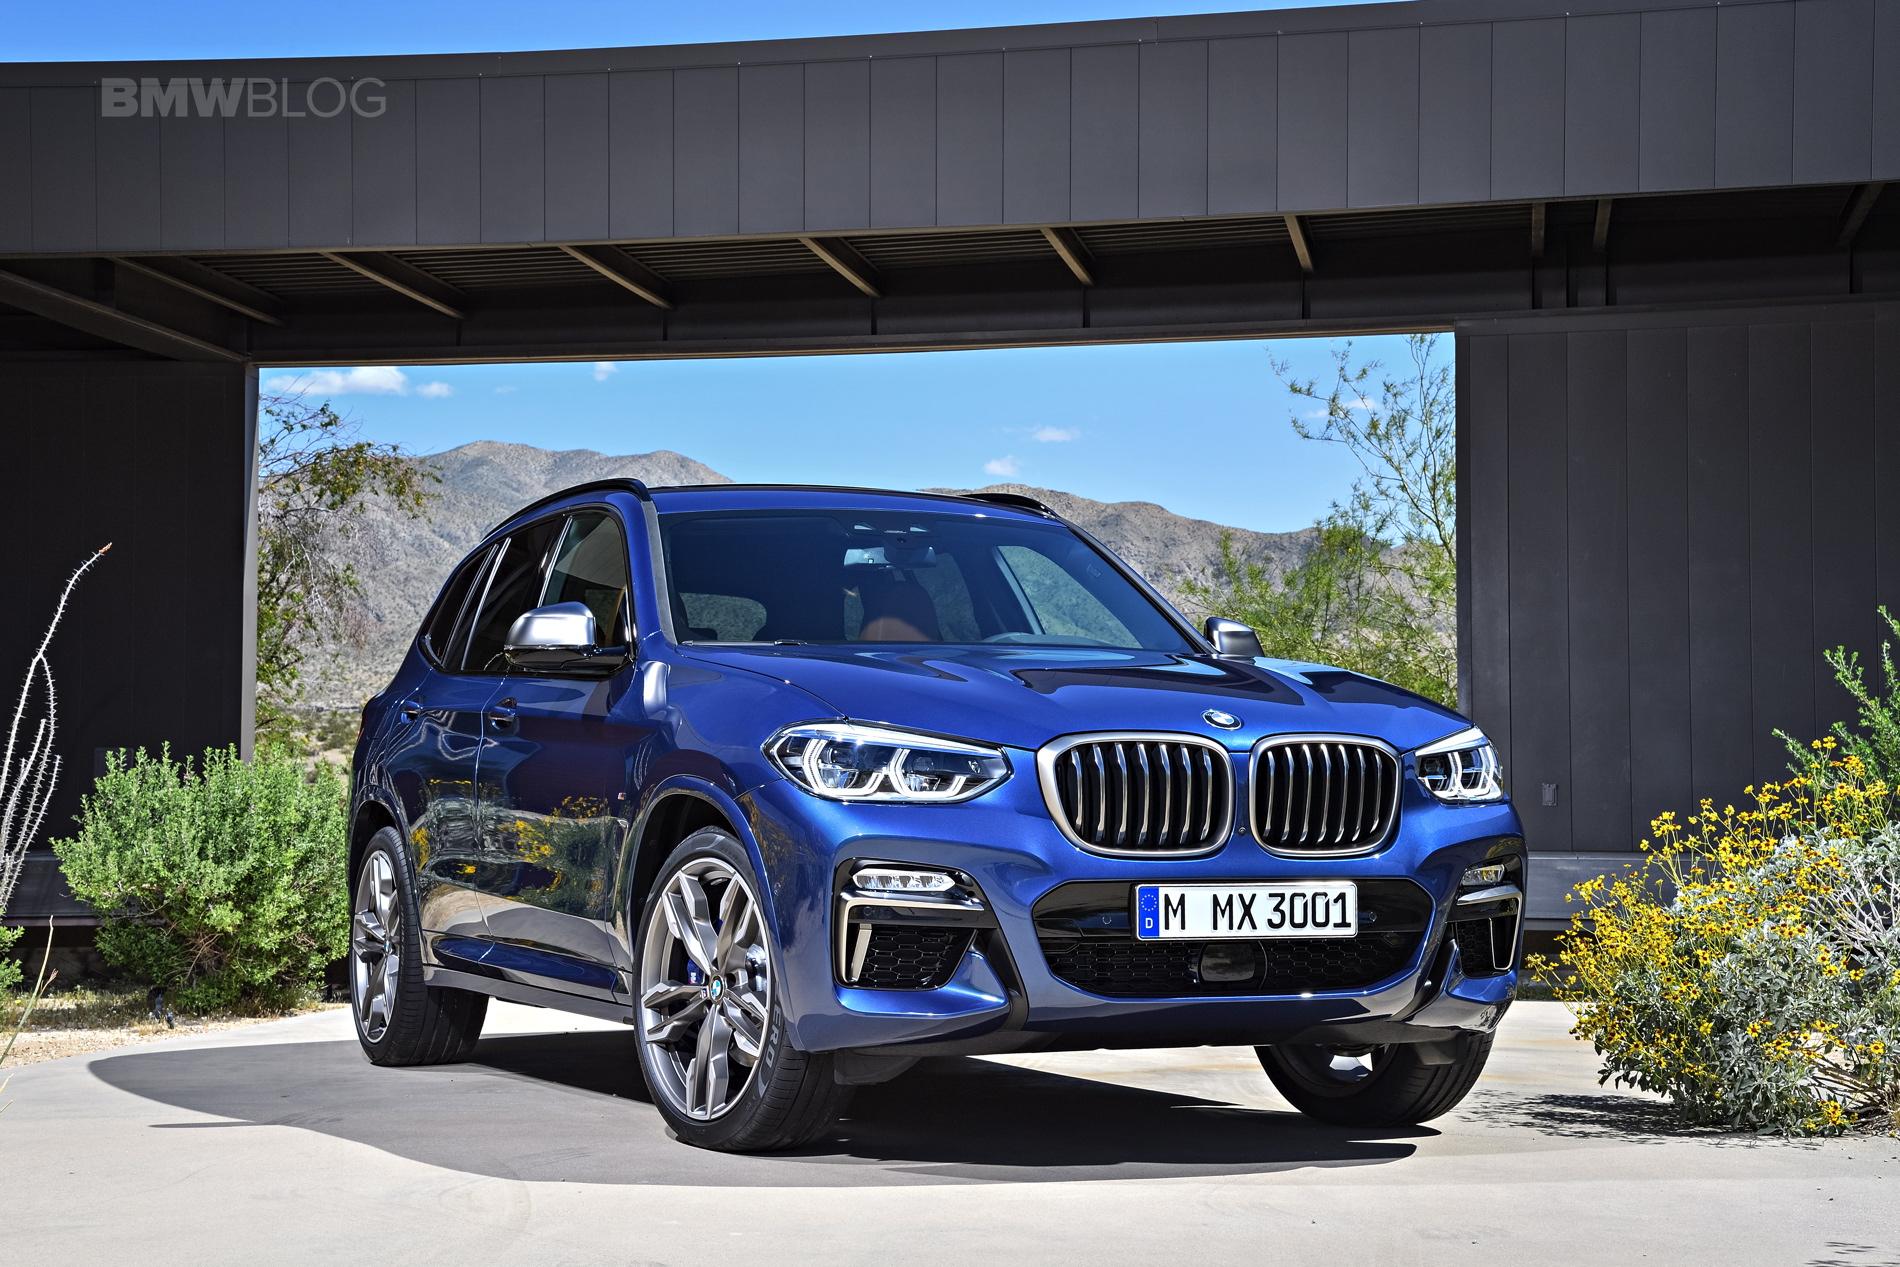 2018-BMW-X3-G01-01